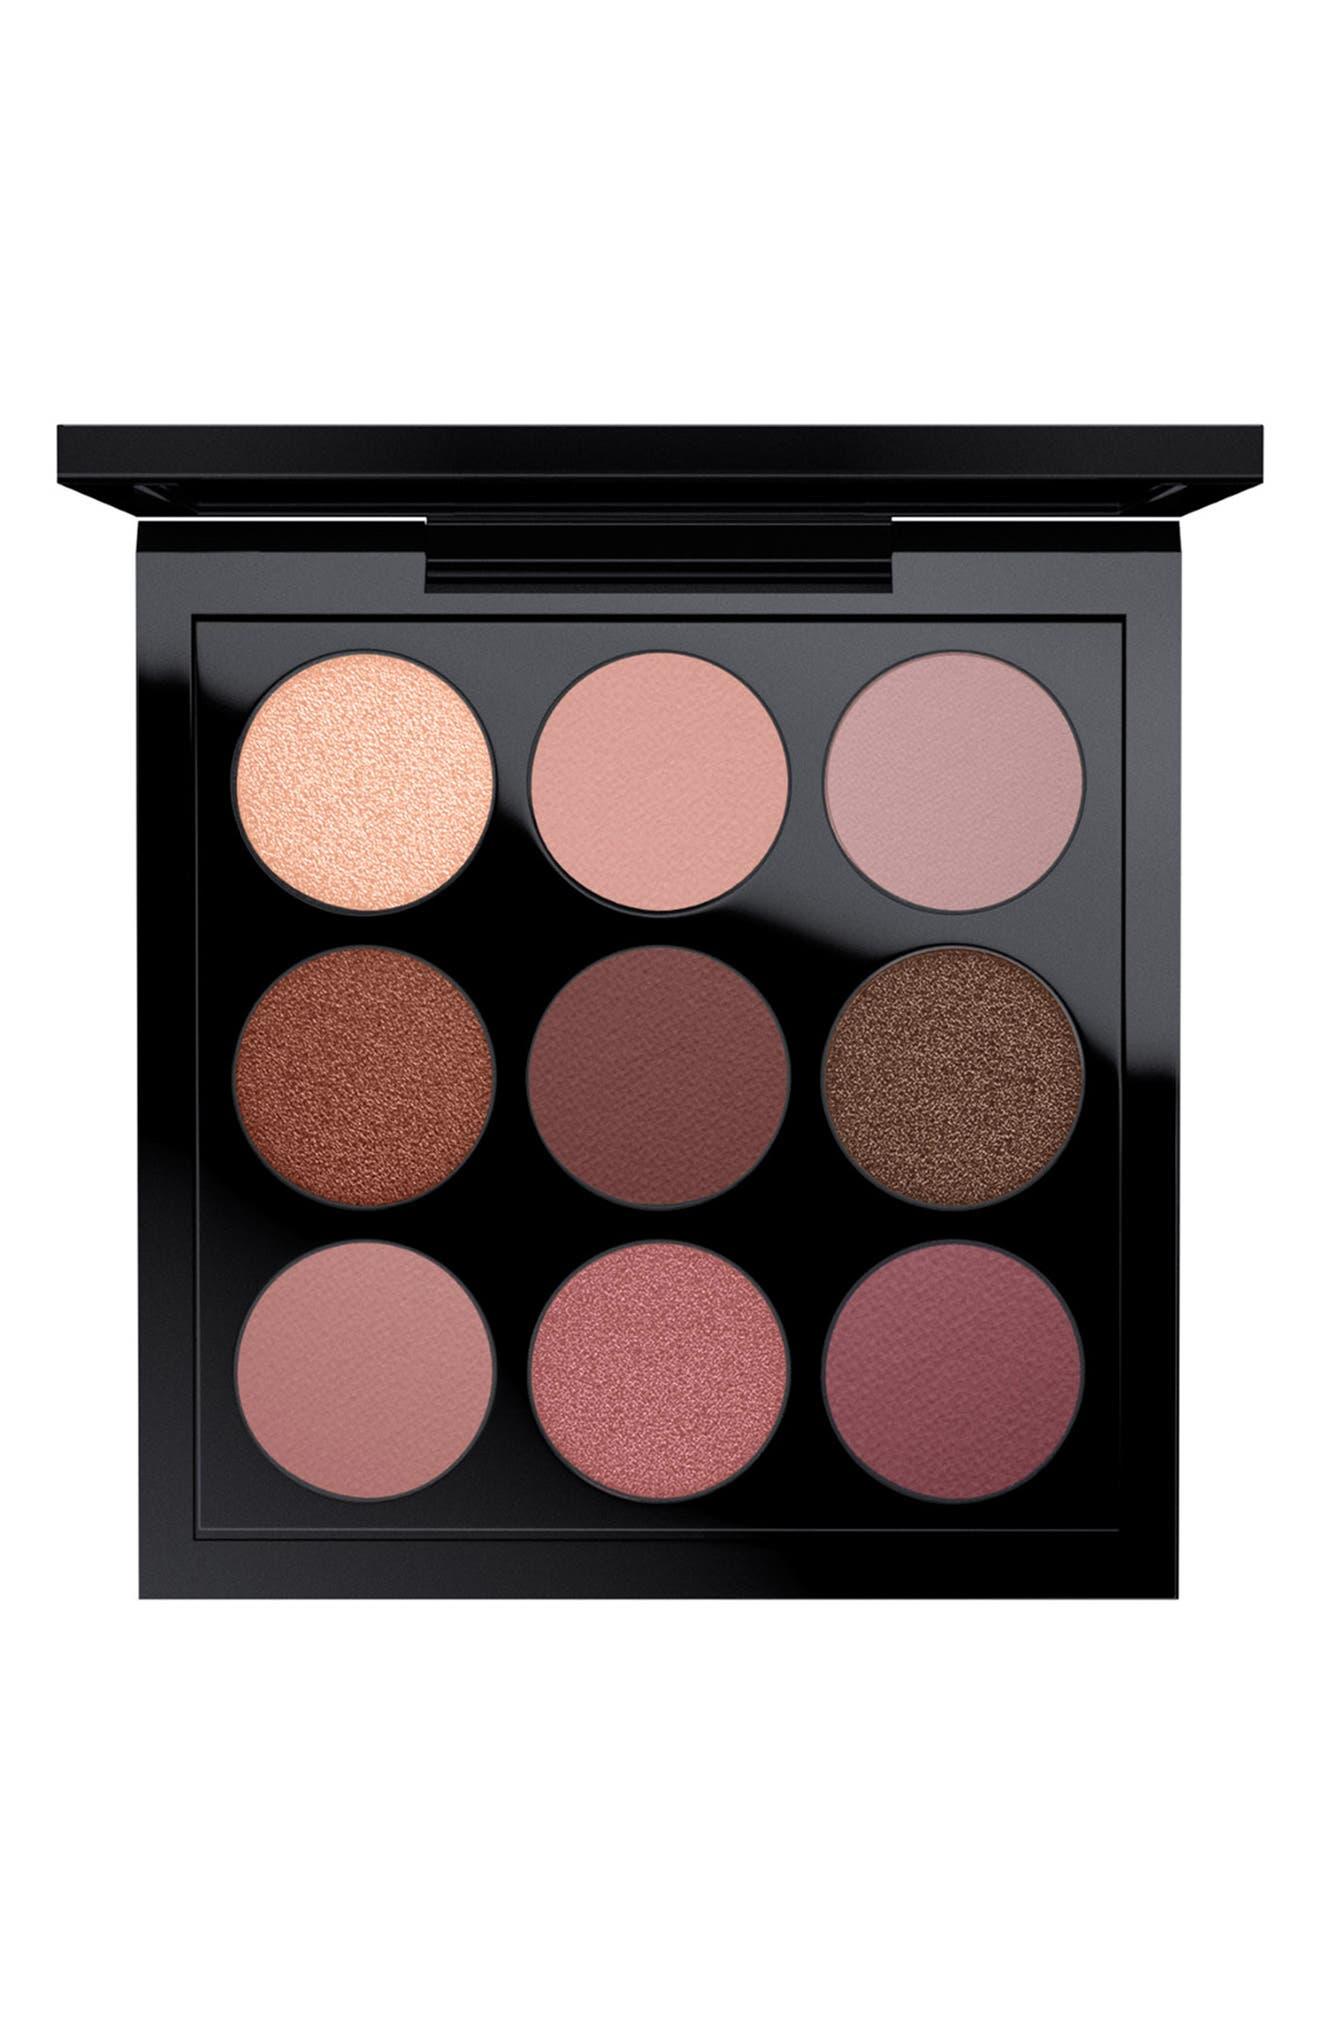 MAC Times Nine Eyeshadow Palette ($53 Value)